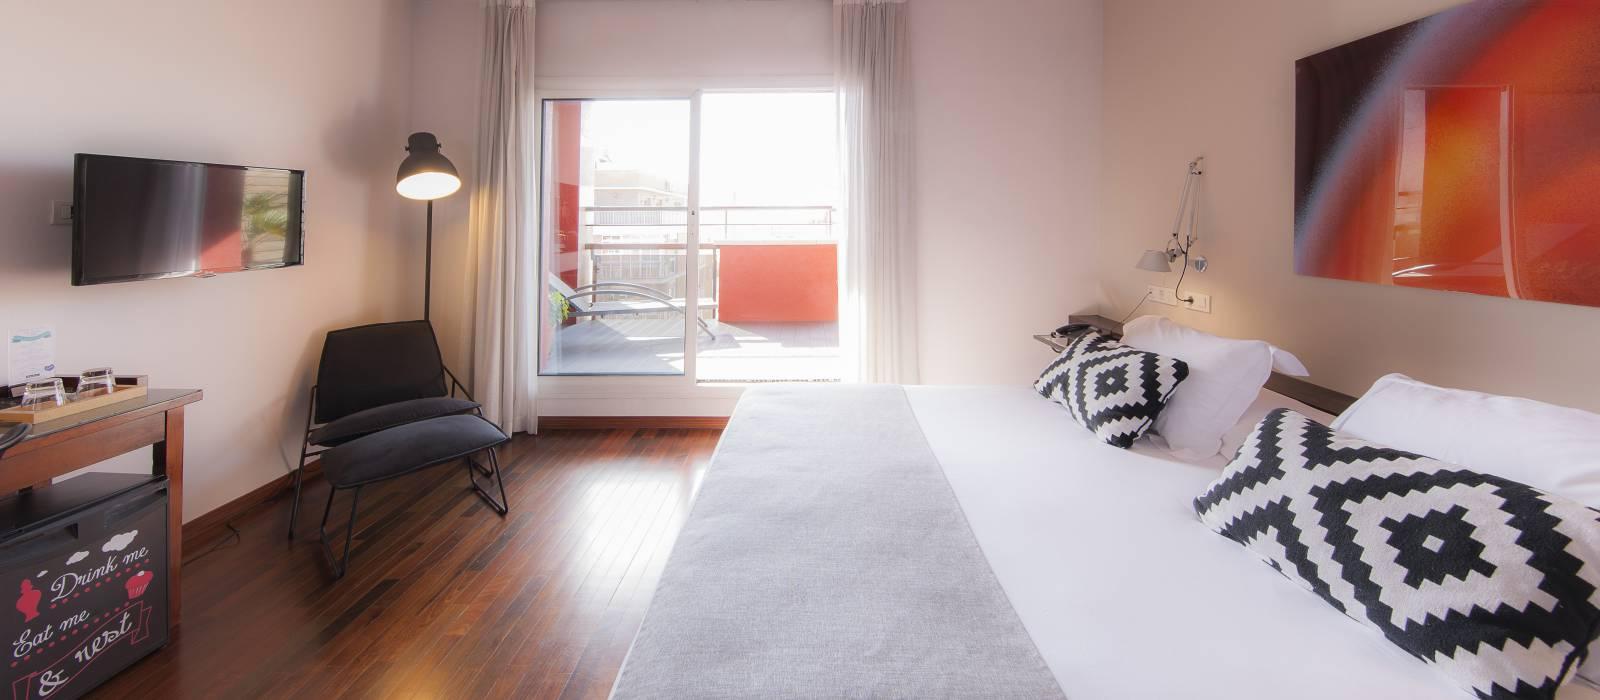 Offerte Soma Hotel Vincci Madrid - Due Notti Speciali